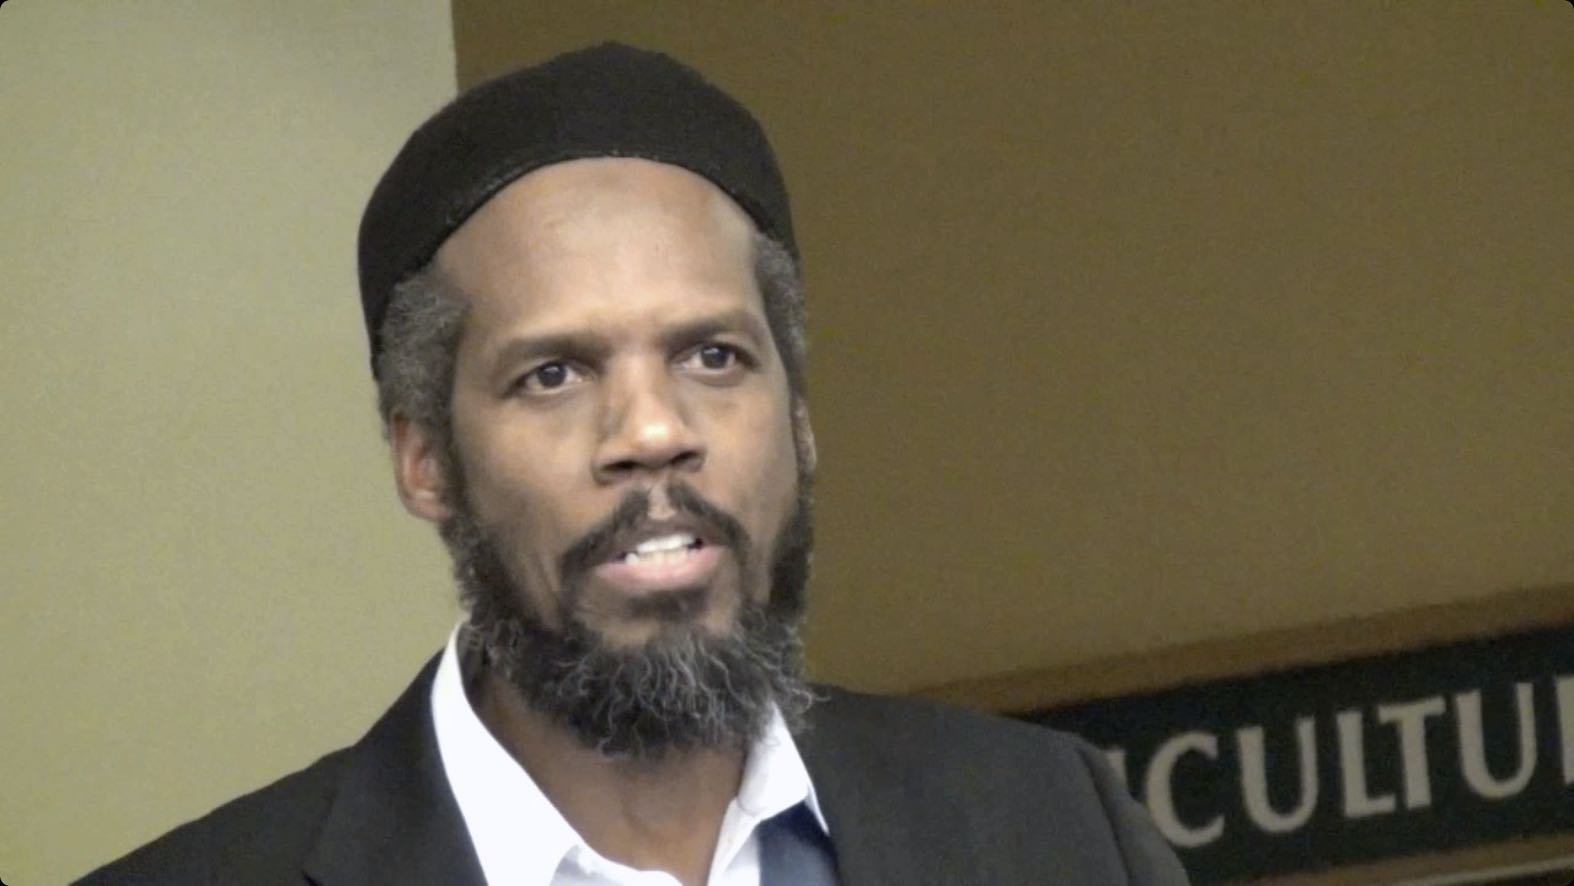 Imam Azhar Haneef